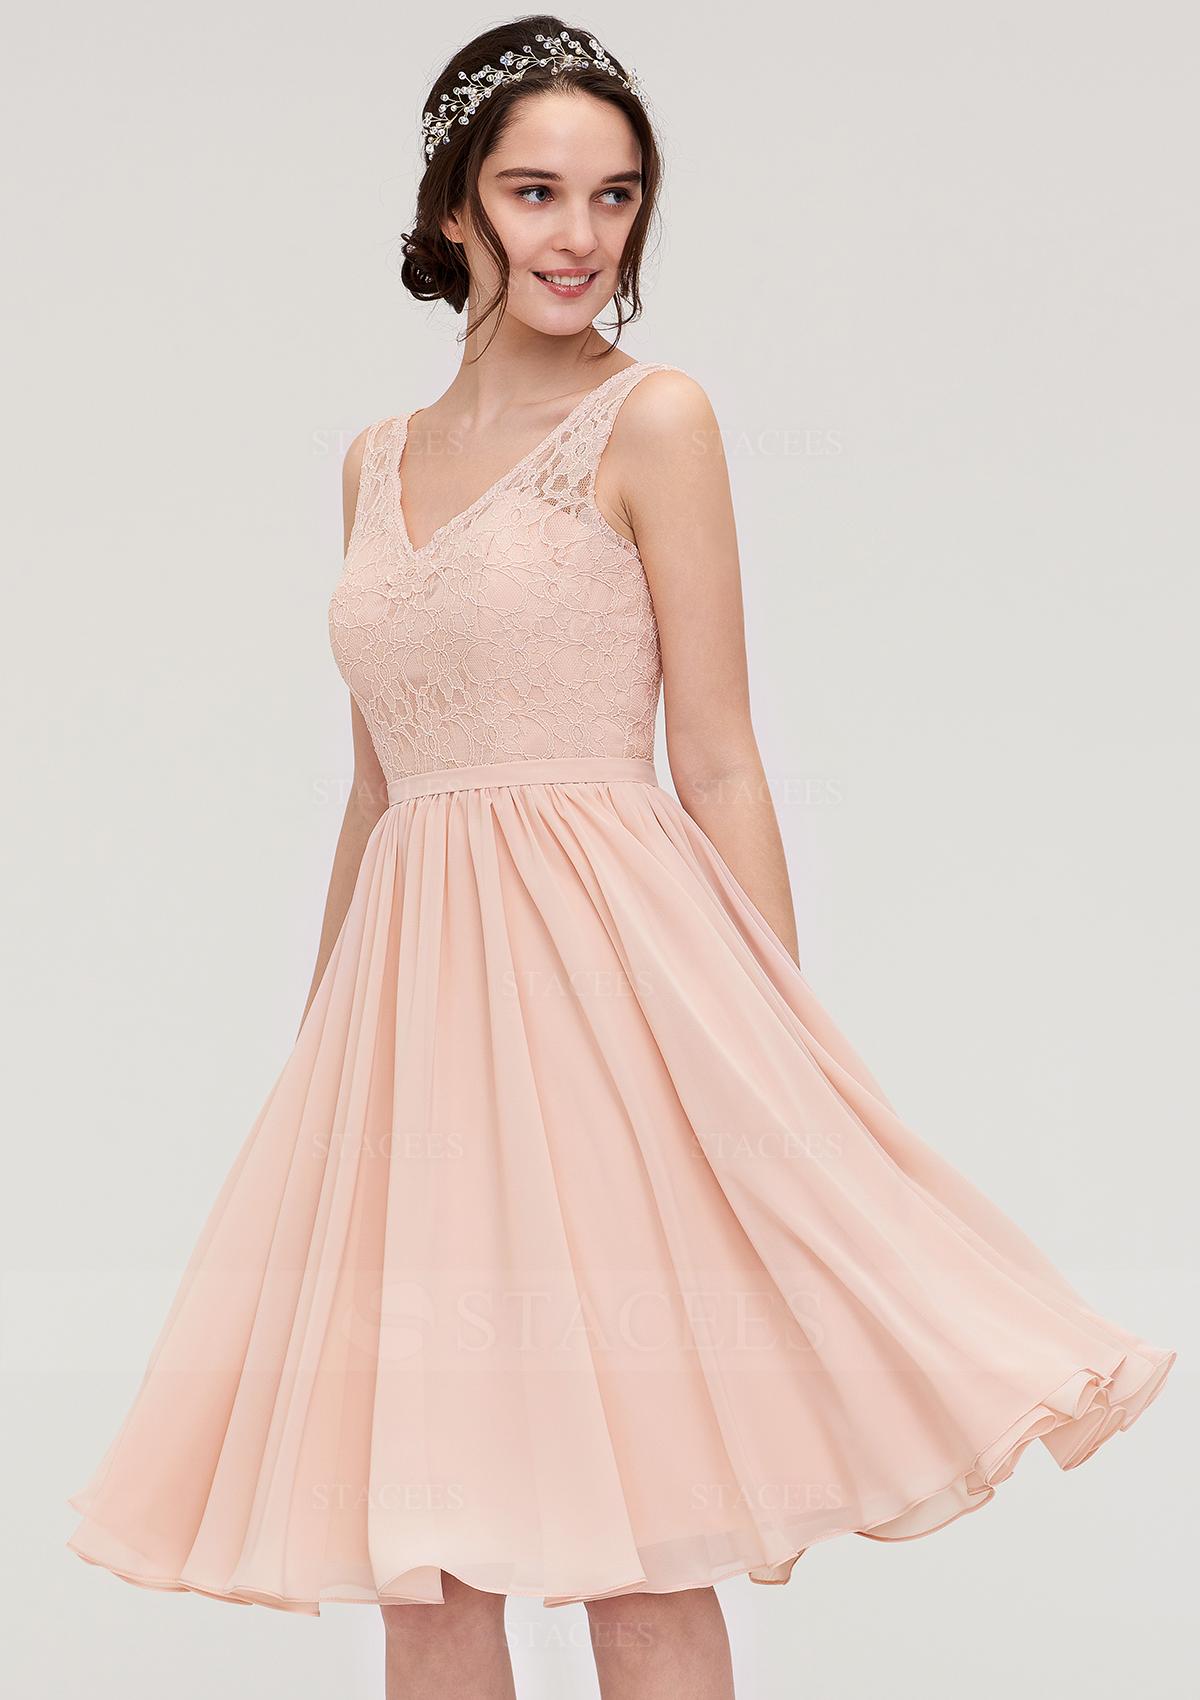 d37ea0e86c A-line Princess V Neck Sleeveless Knee-Length Chiffon Bridesmaid ...